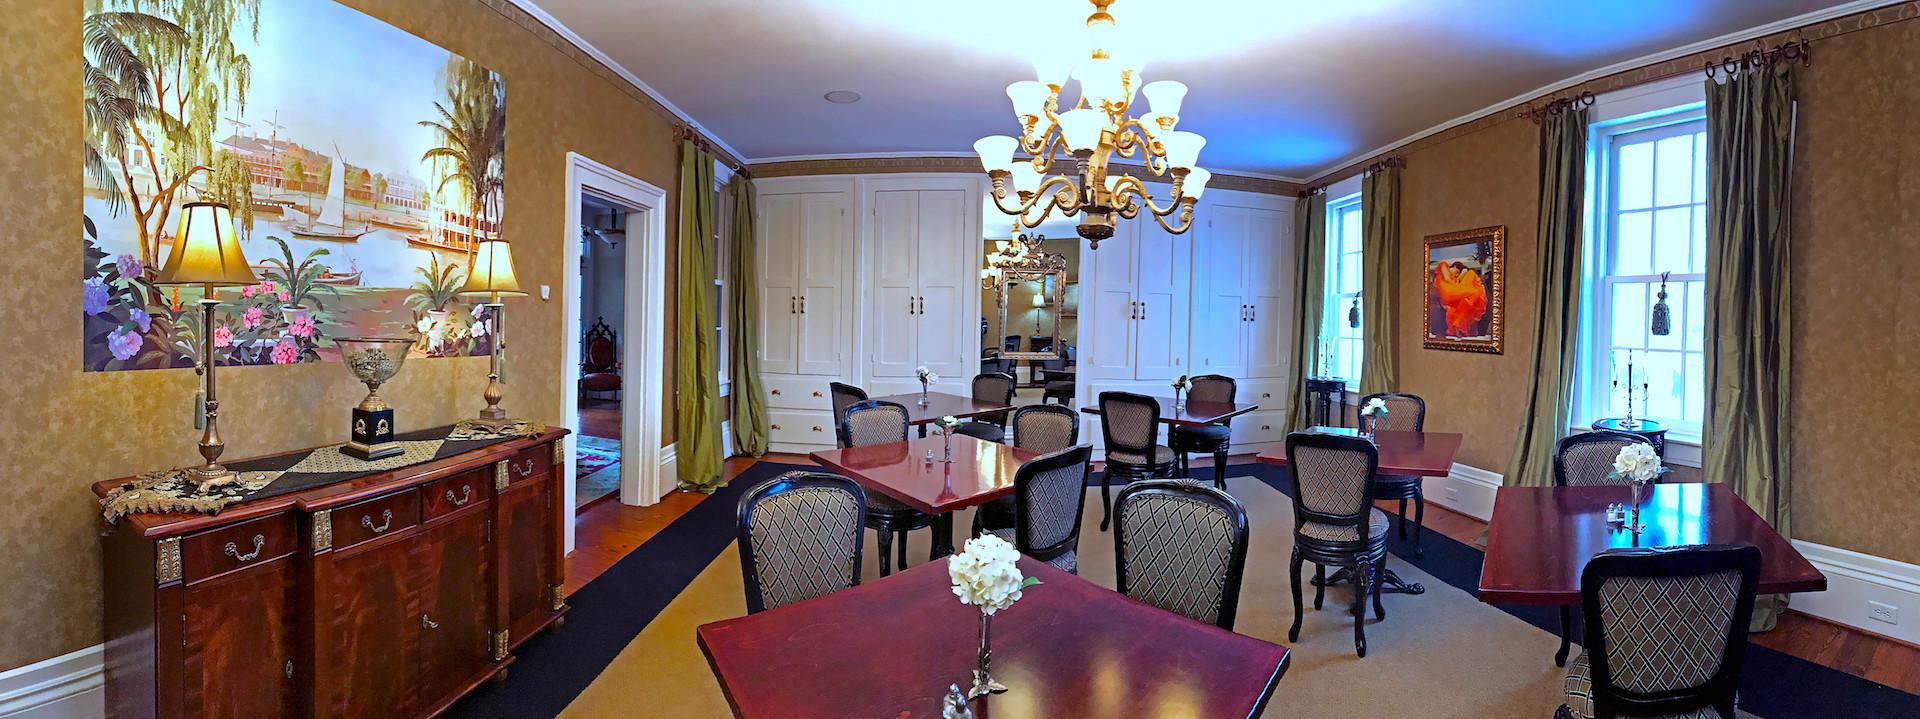 Cedarcrest Dinning Room - Overlook Farm